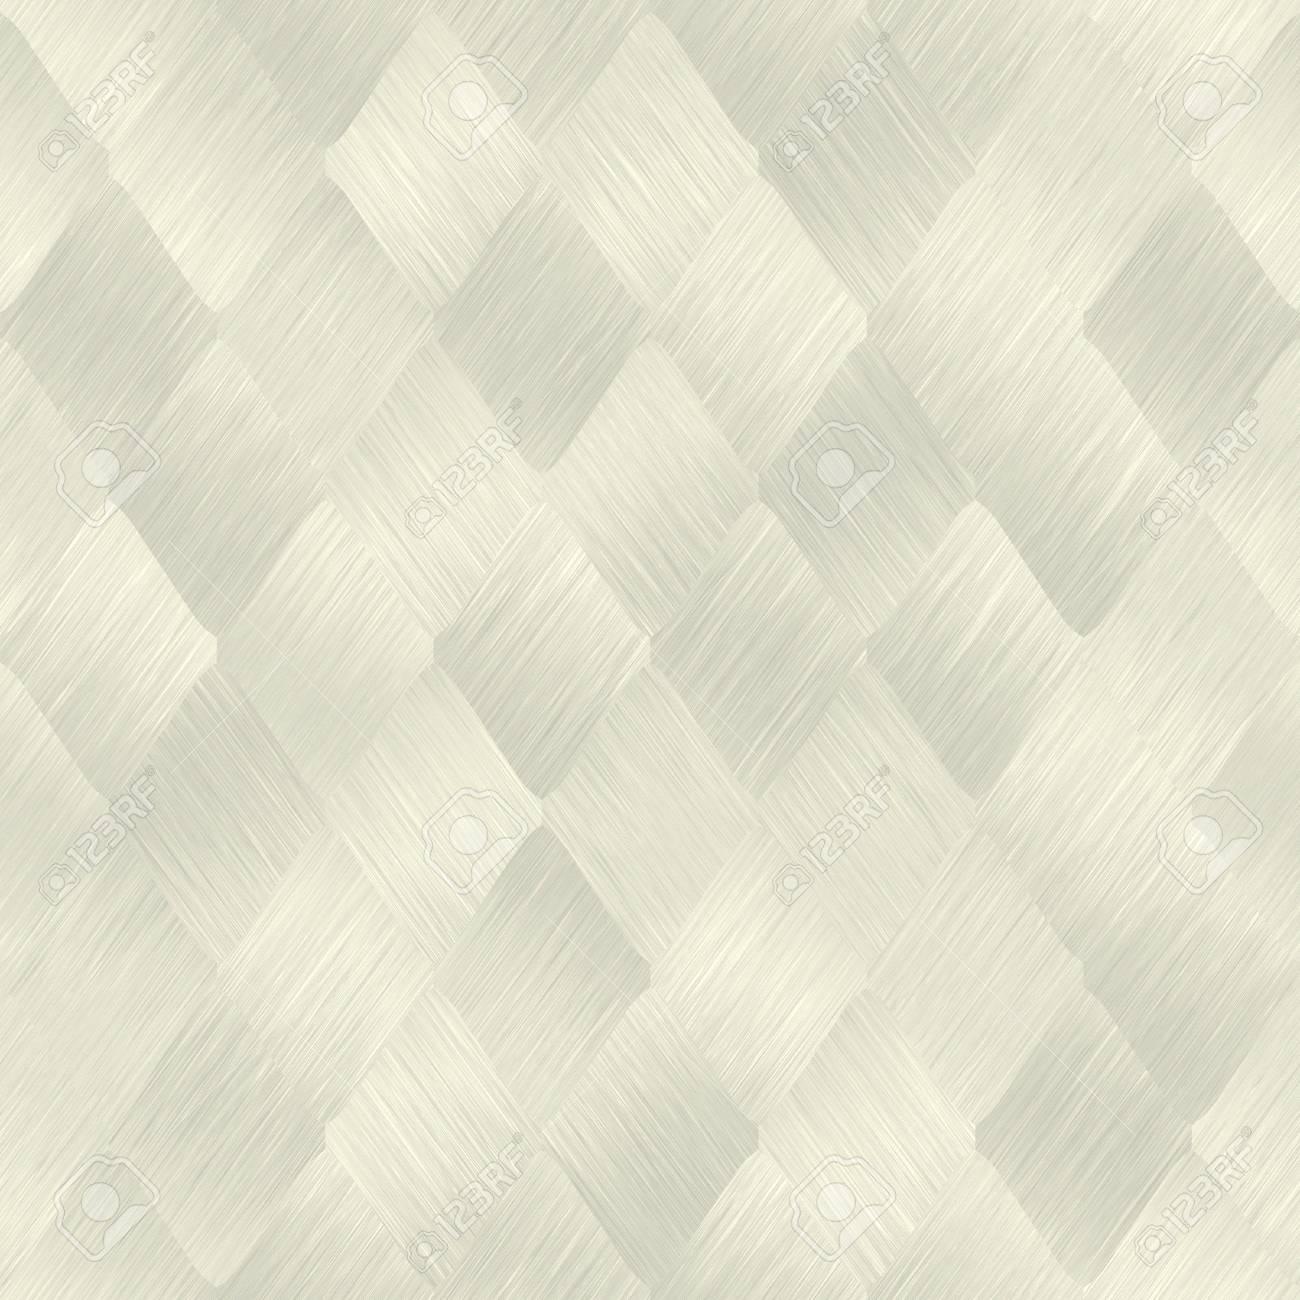 Metal tiles. Seamless texture. Stock Photo - 20102716